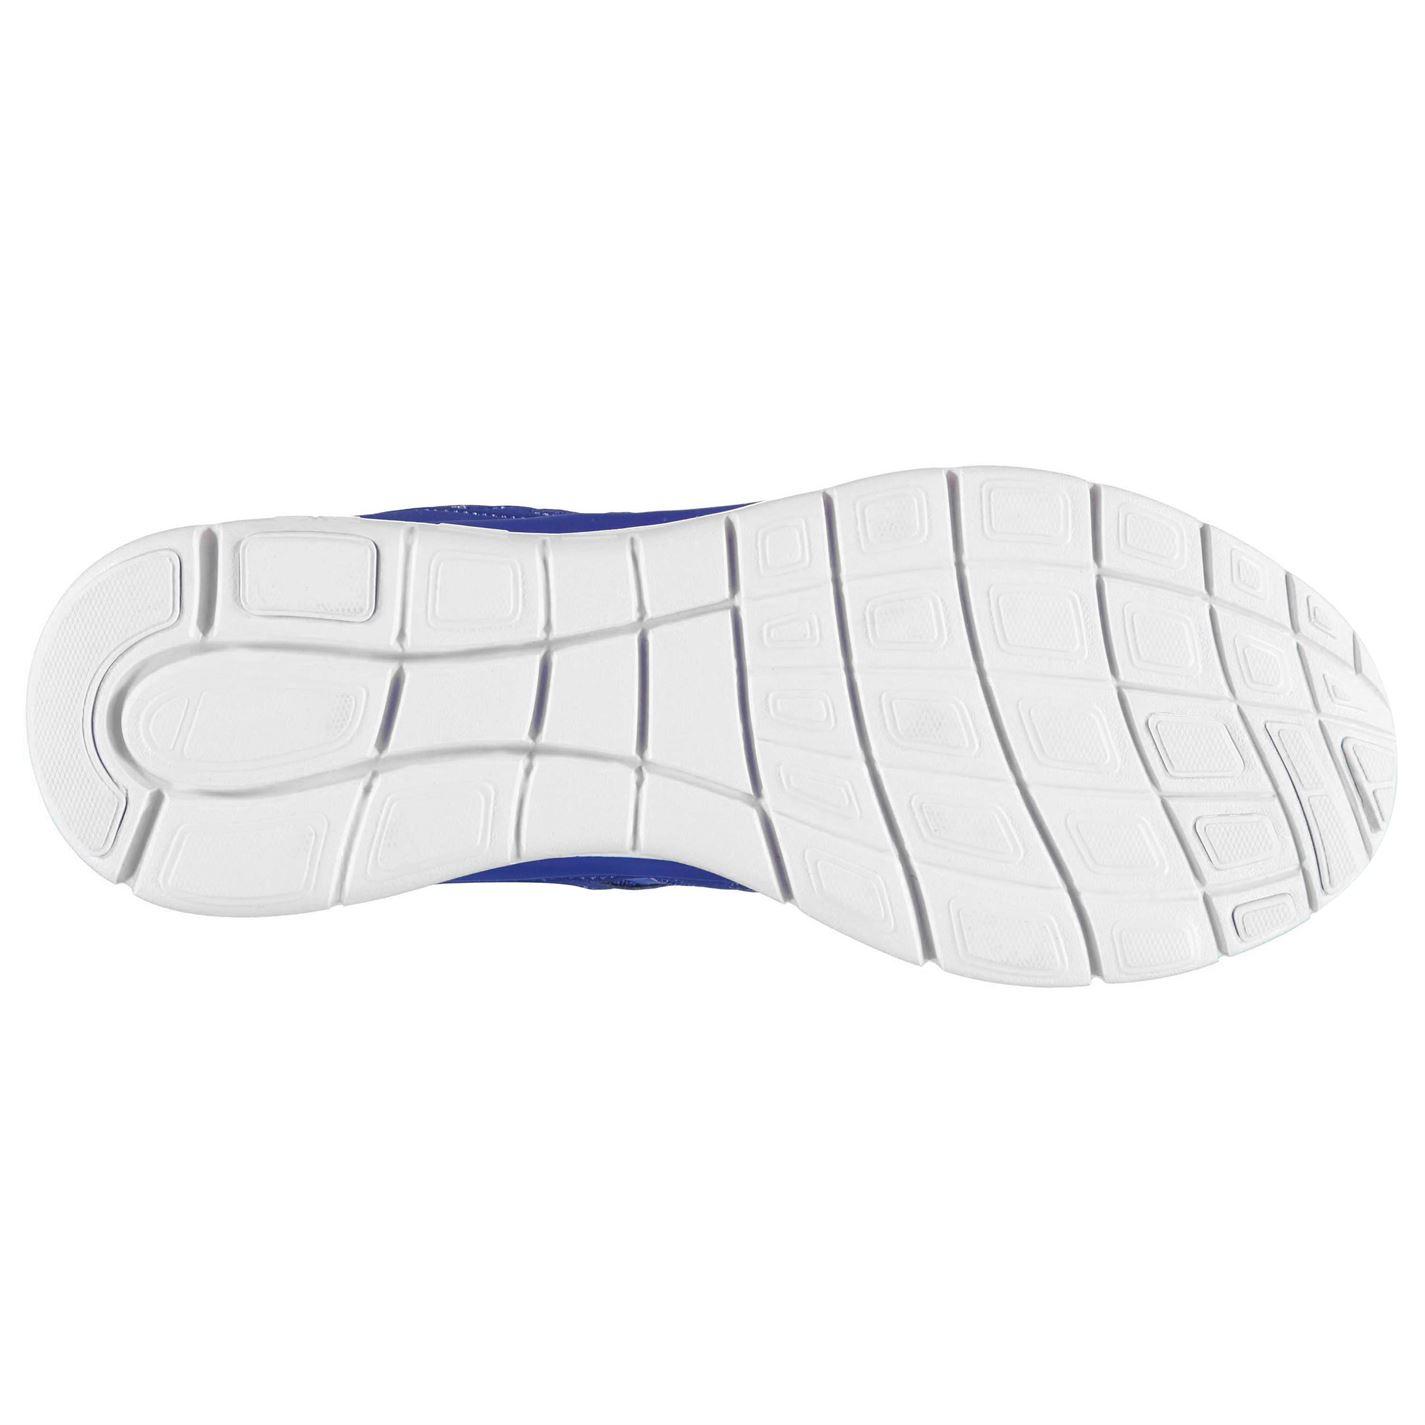 Karrimor Mens Duma Trainers Lace Up Sports Running Cross Training Shoes